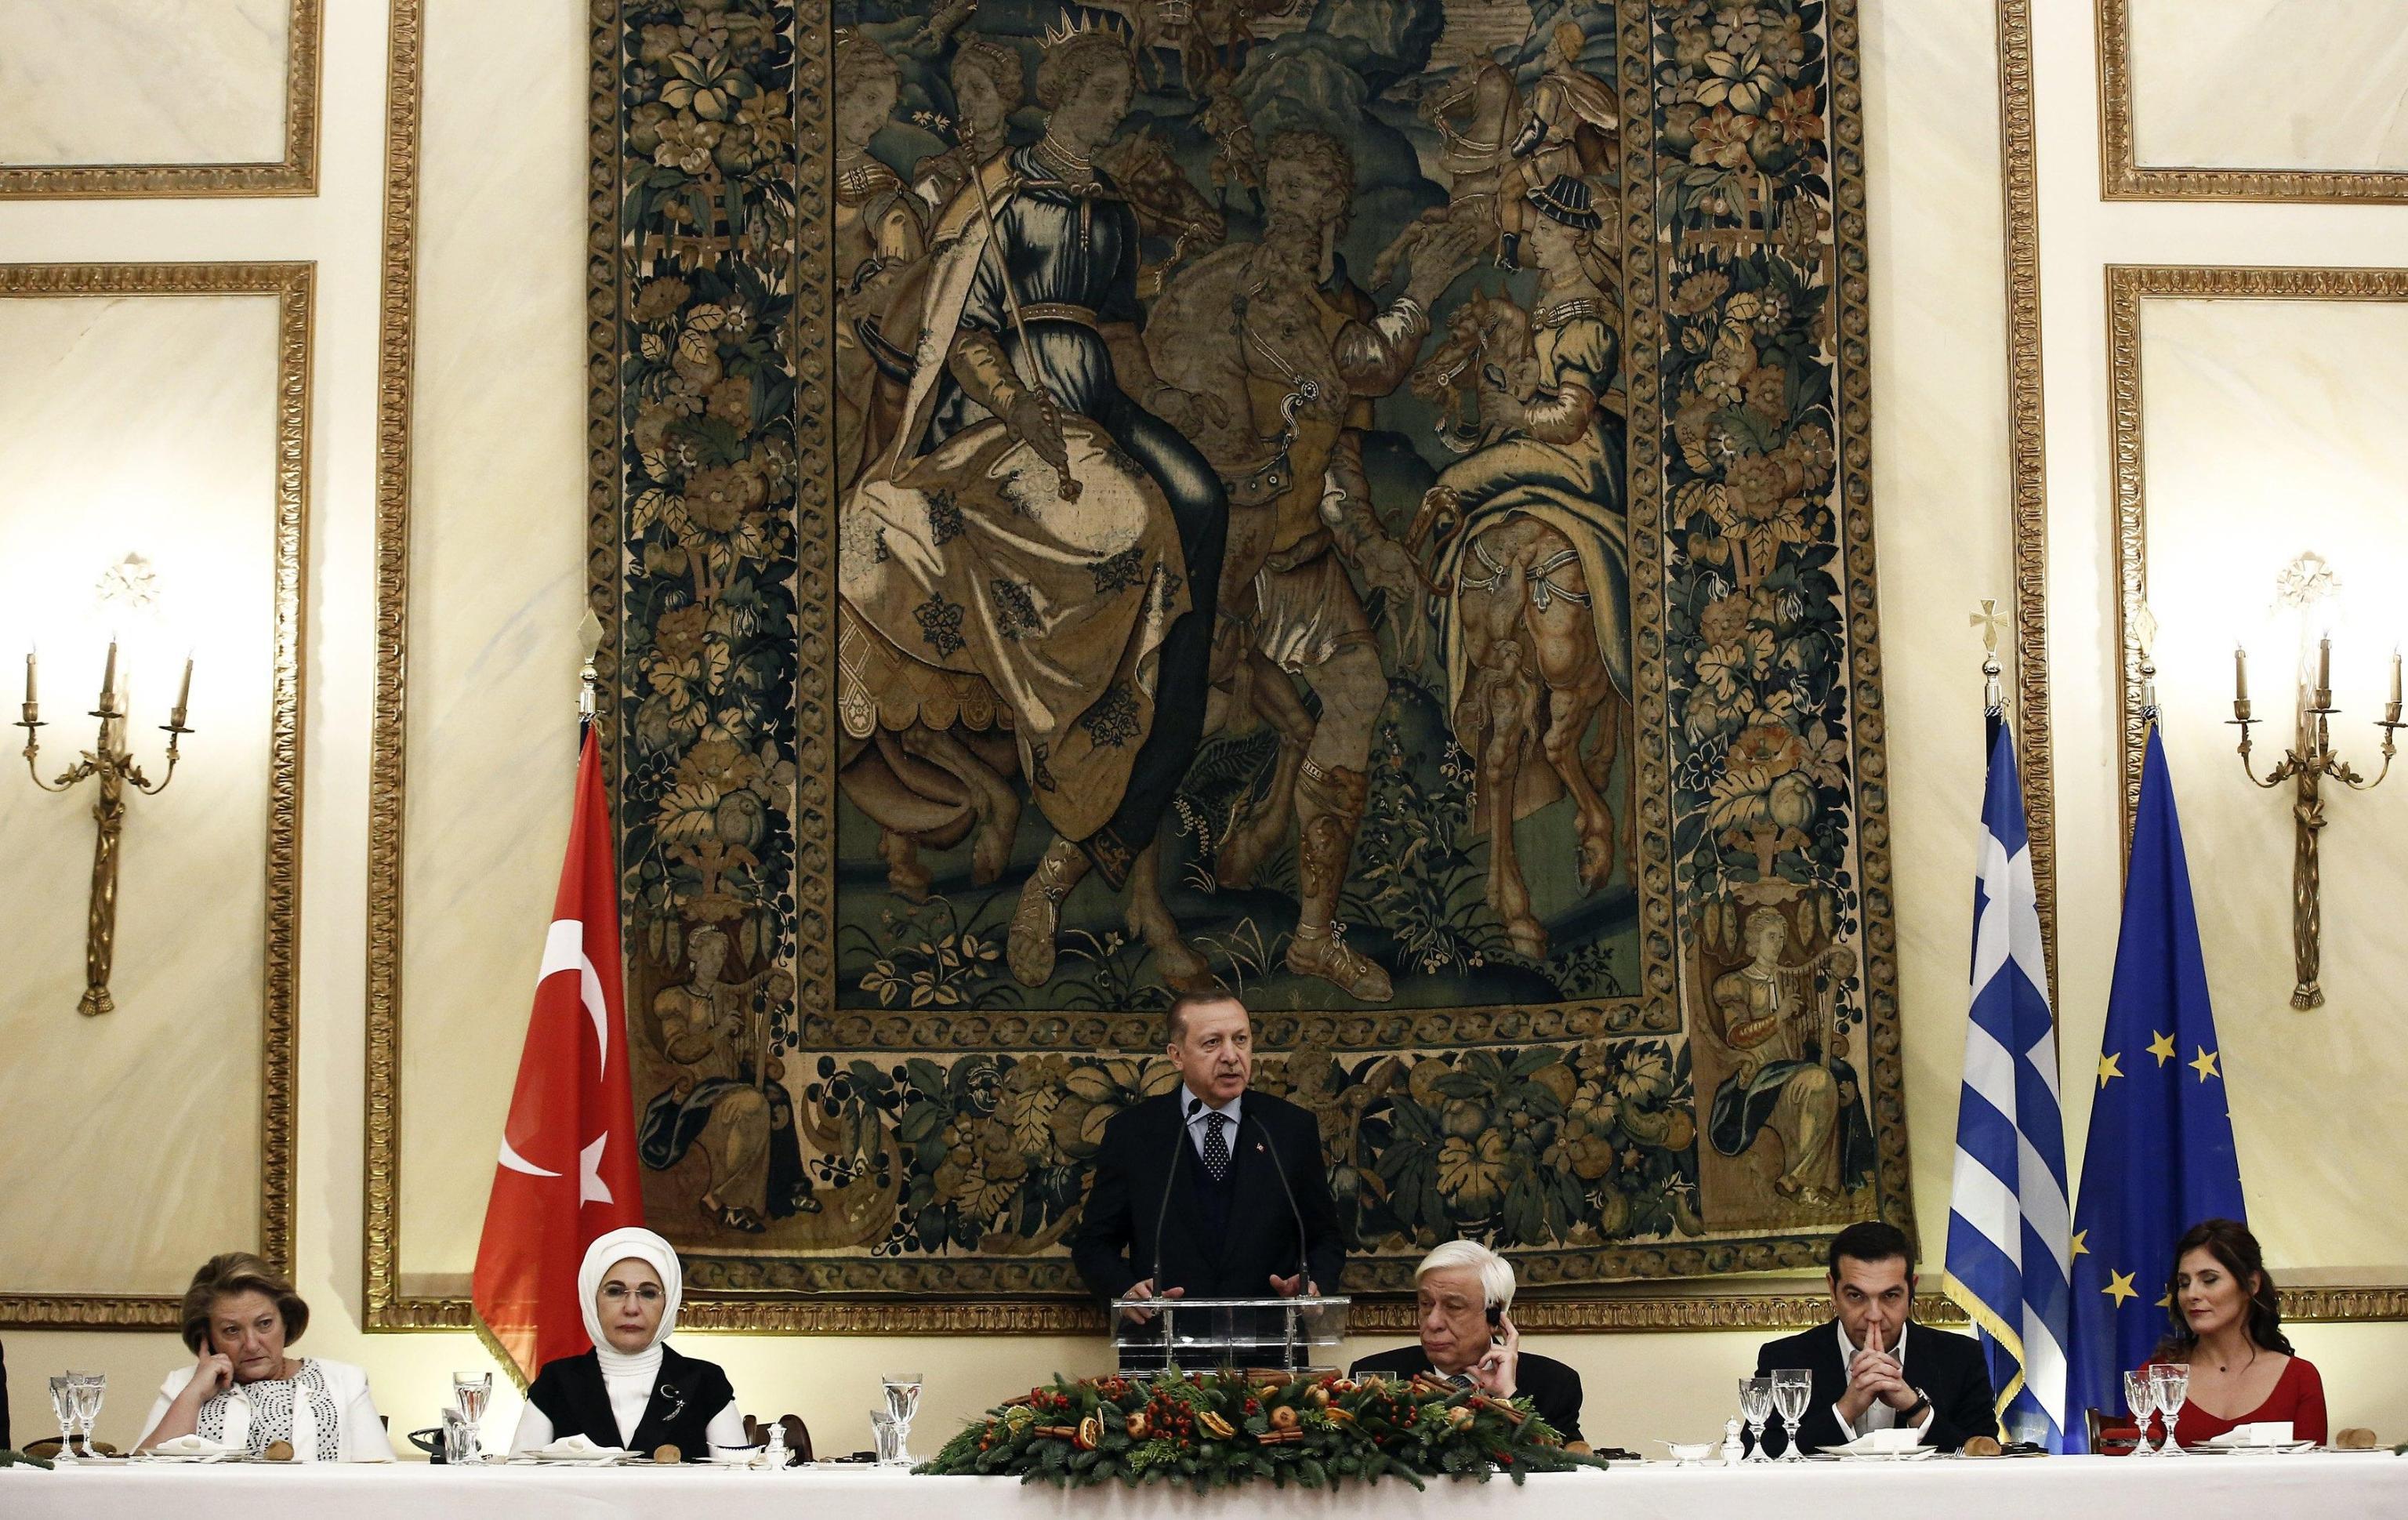 Erdogan in Grecia, incontra musulmani